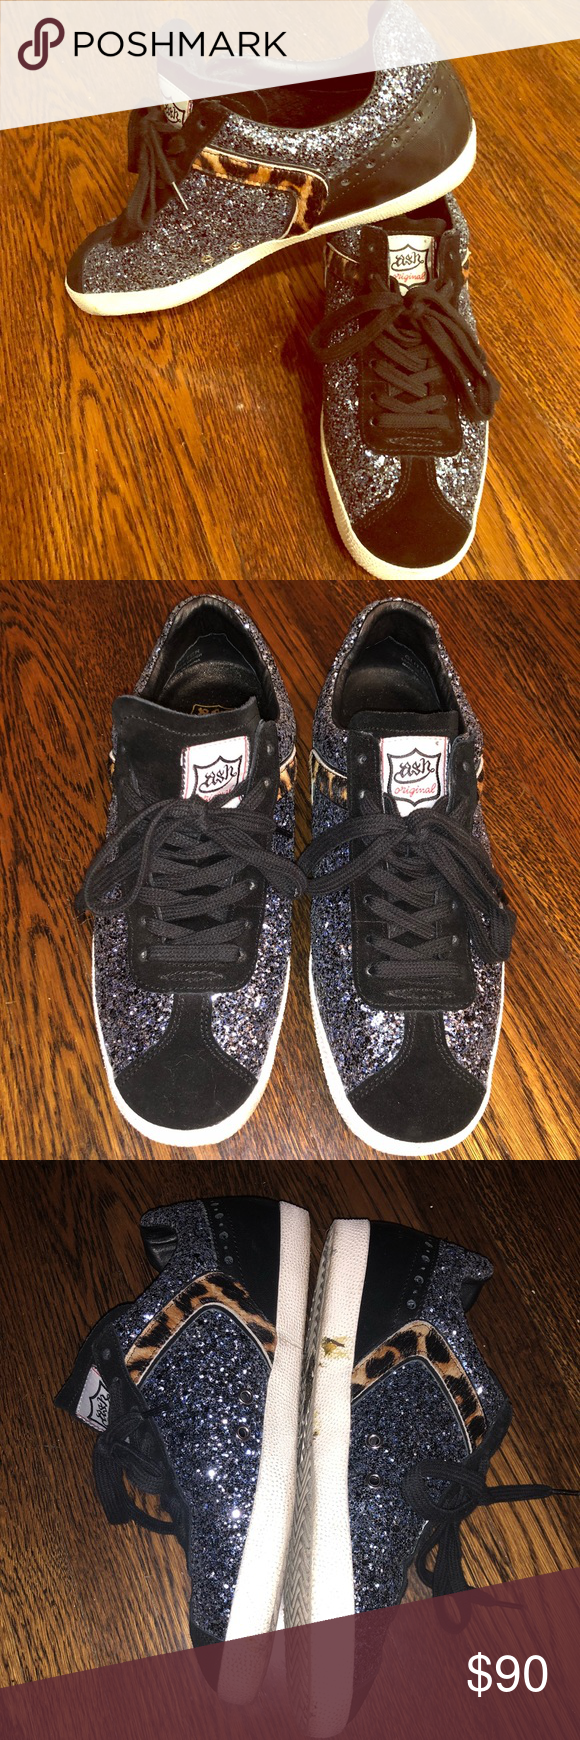 c60ecadb474a2 New Listing 💎Ash leopard   glitter sneaker ASH🌟 38🌟 leather suede parts